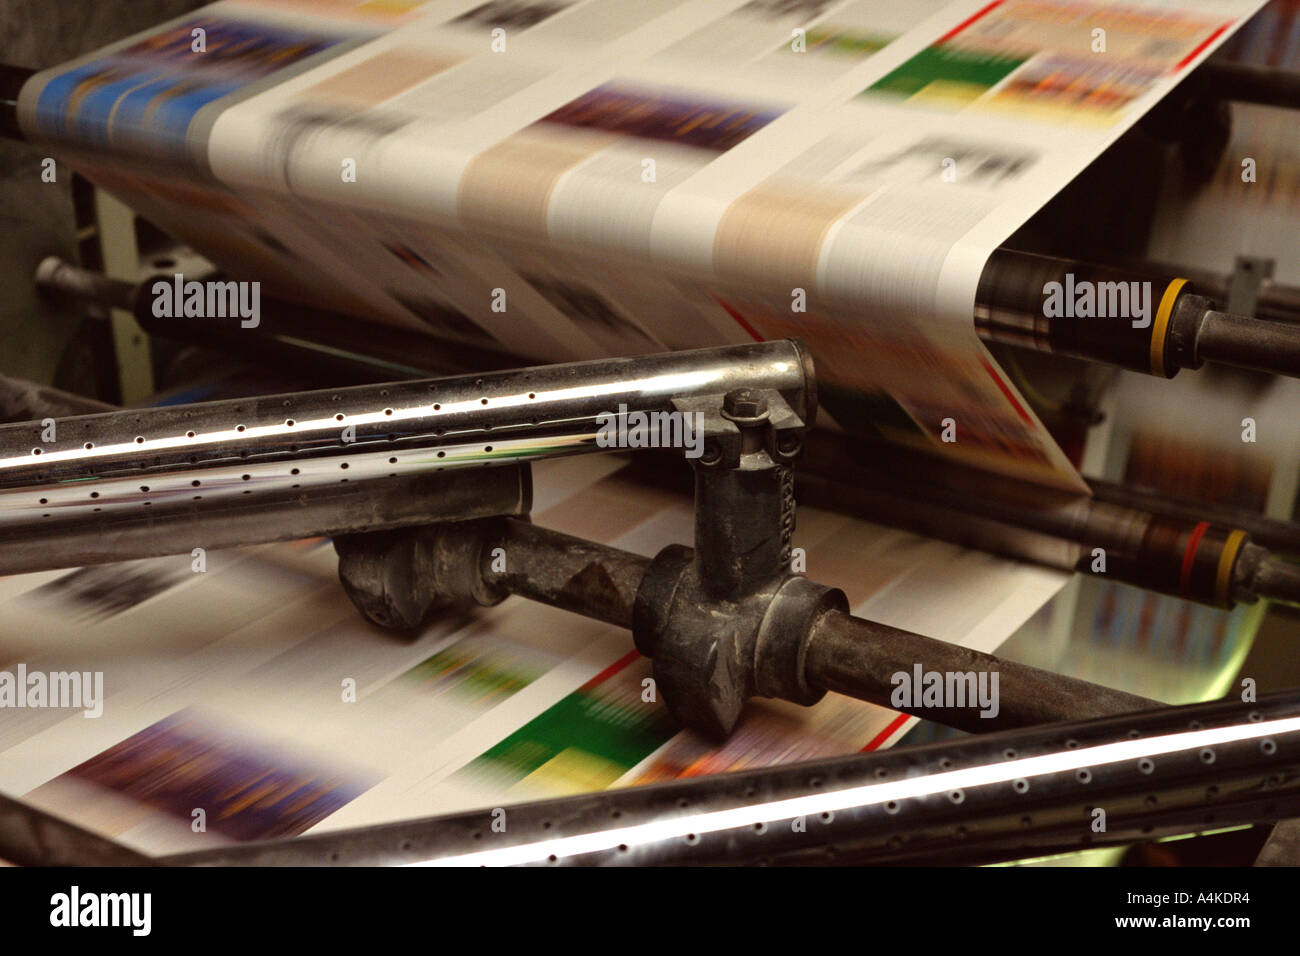 Printing press - Stock Image